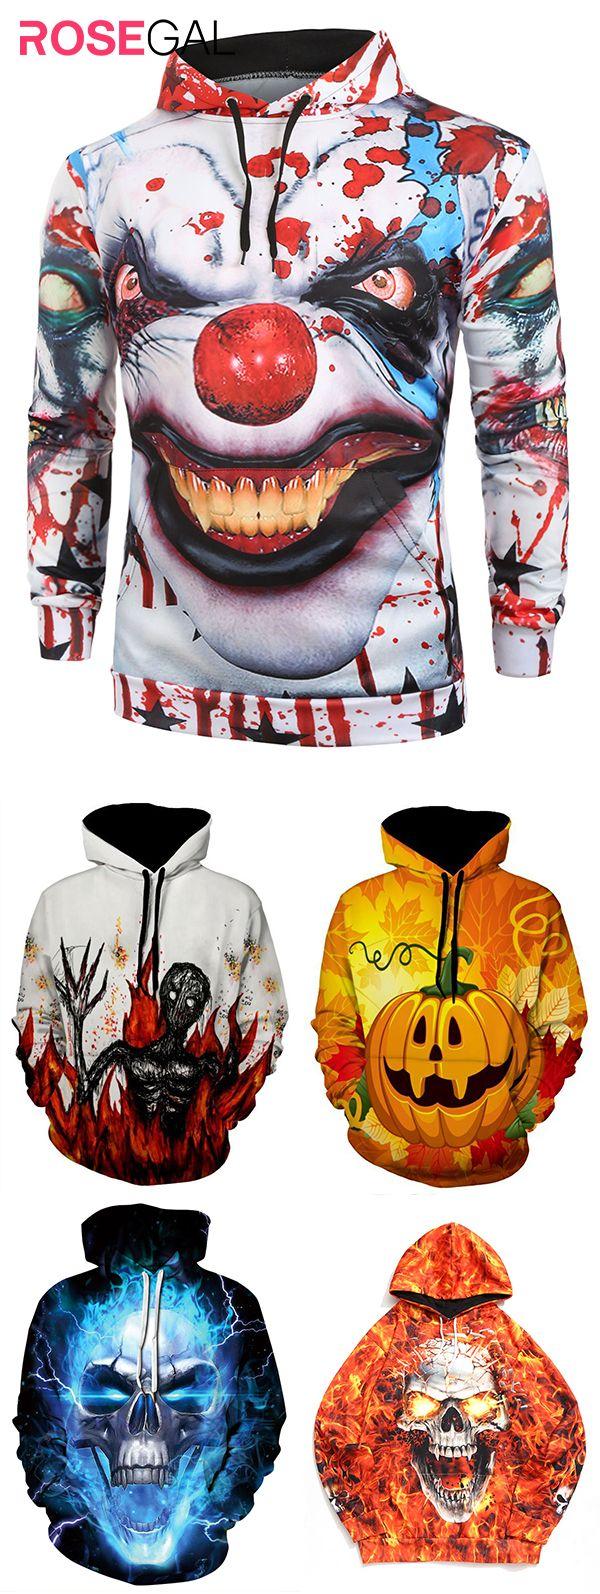 Rosegal mens sweatshirts Halloween pattern print hoodie ideas – Christian Makolla